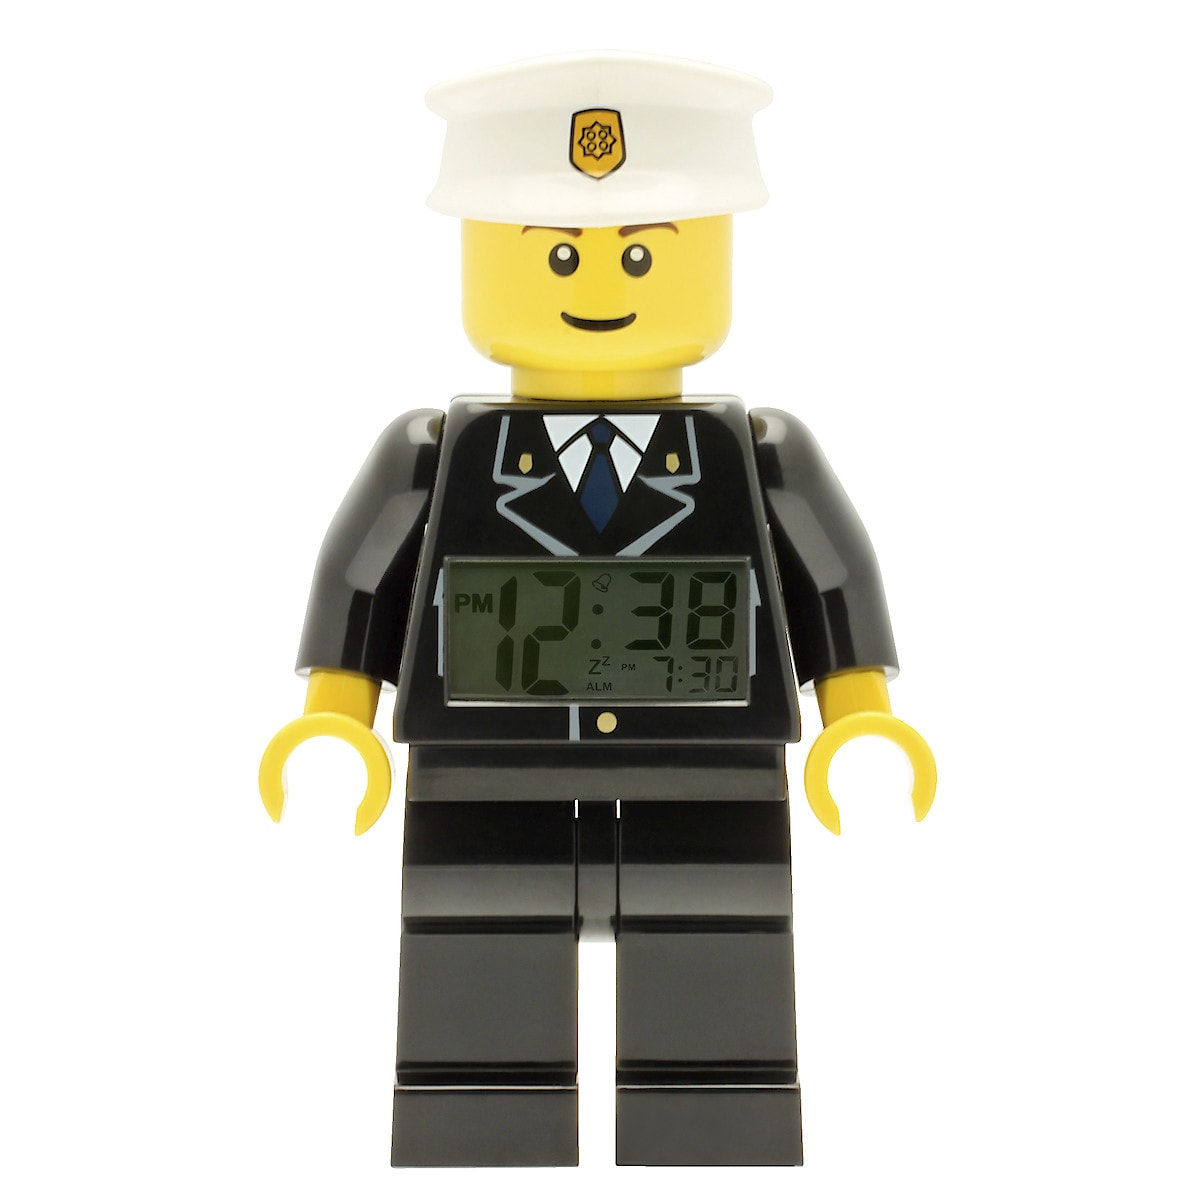 Lego City Police Alarm Clock